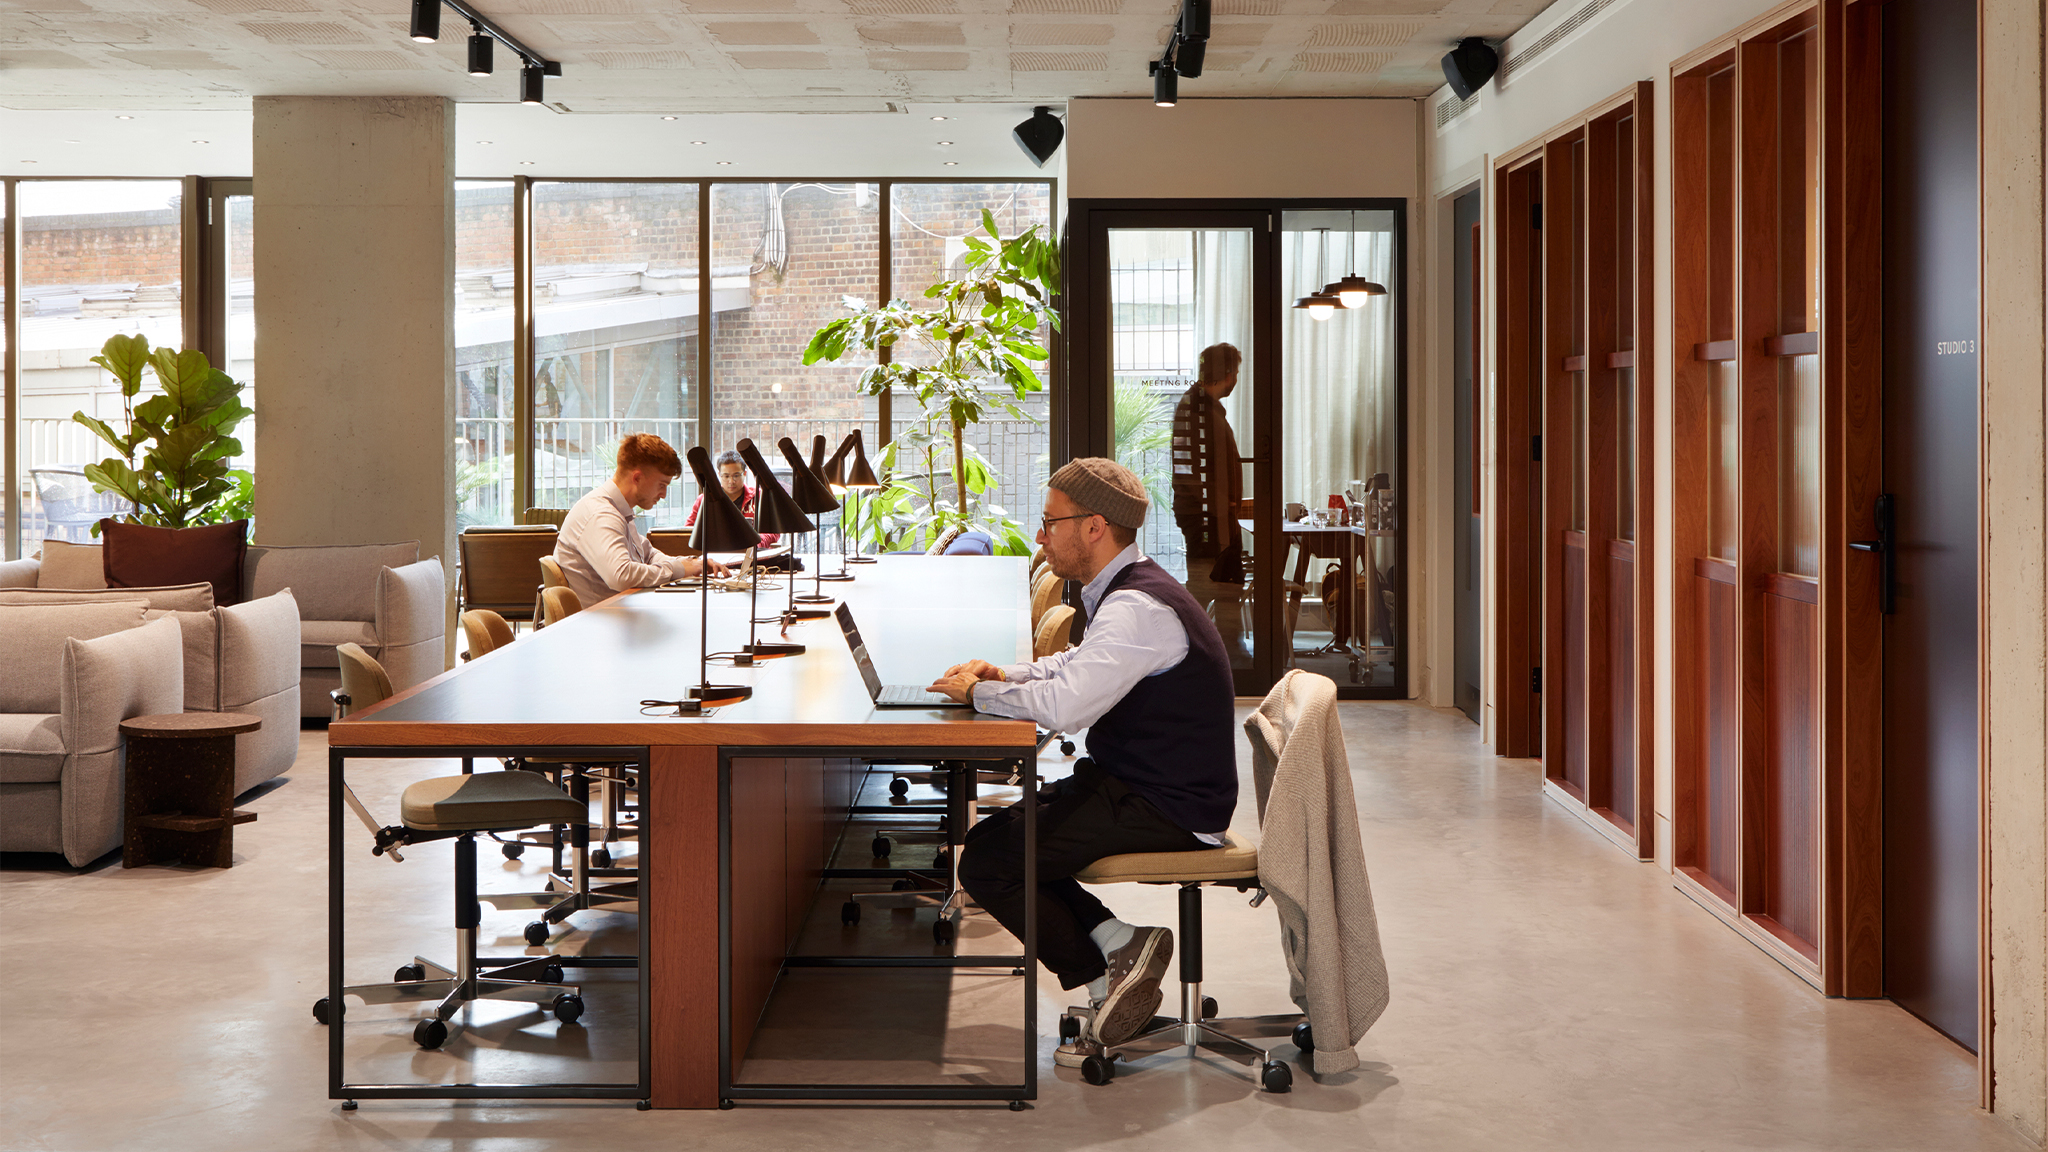 Inspiring Working Environments